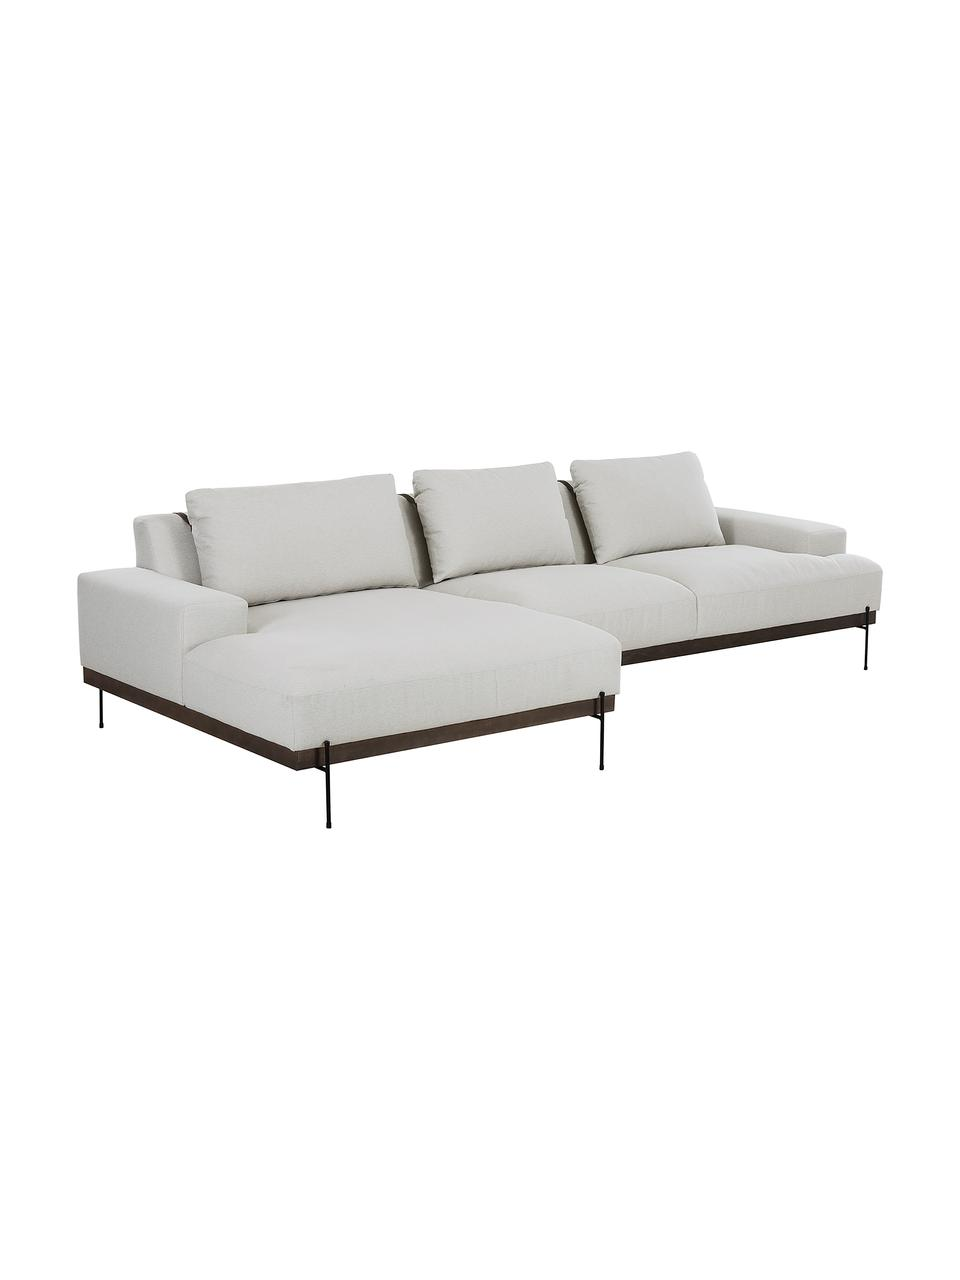 Canapé d'anglebeige Brooks, Tissu beige